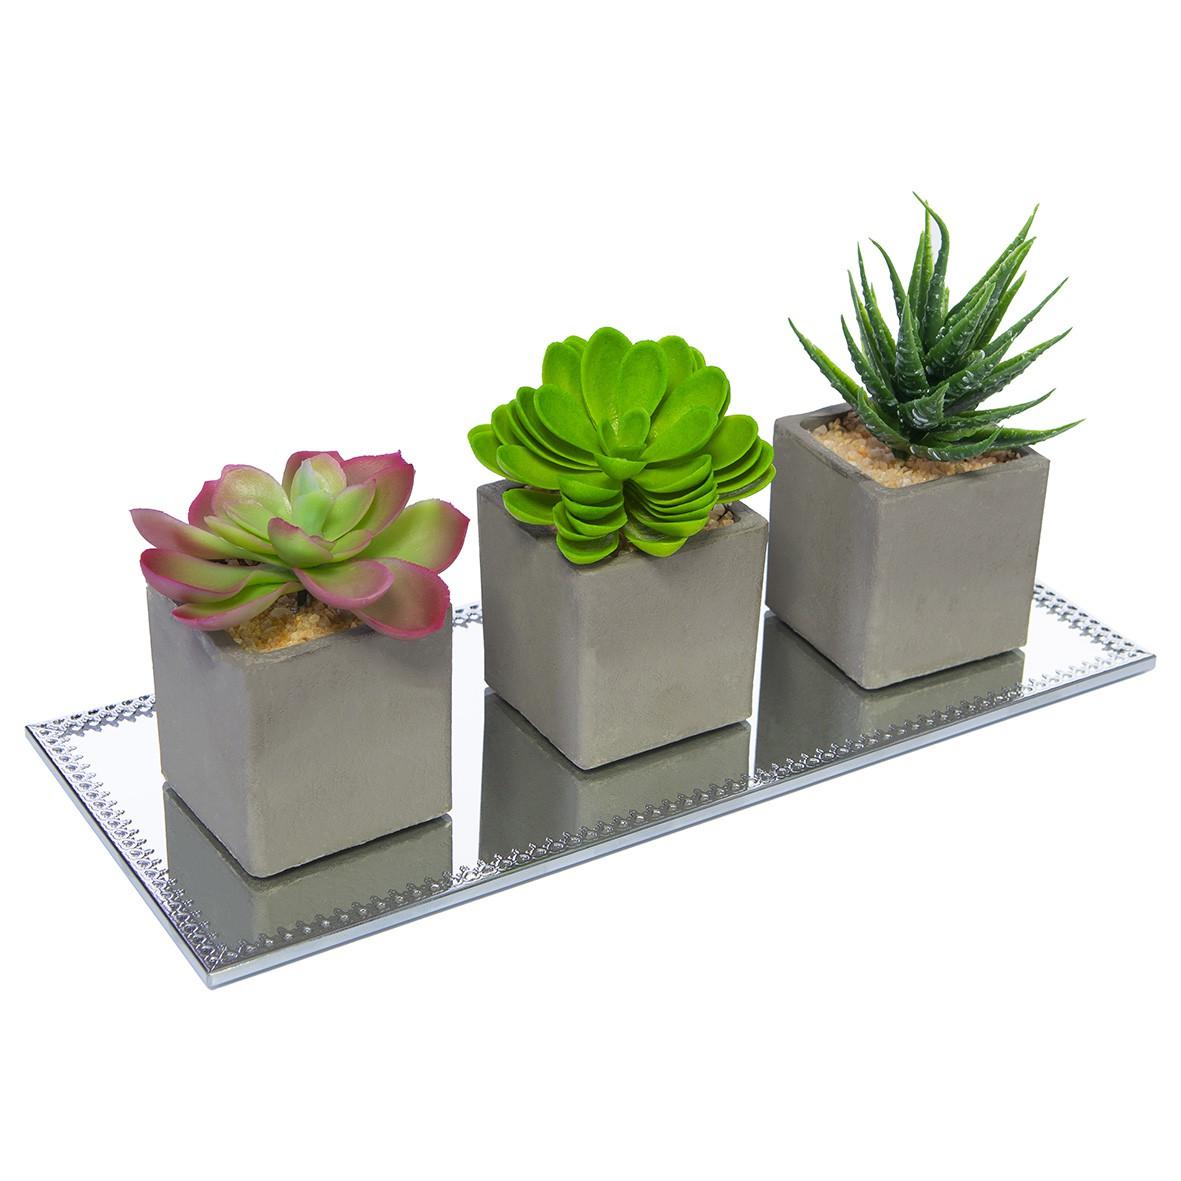 Kit com 3 Vasinhos Decorativos Planta Permanente Suculenta Mini